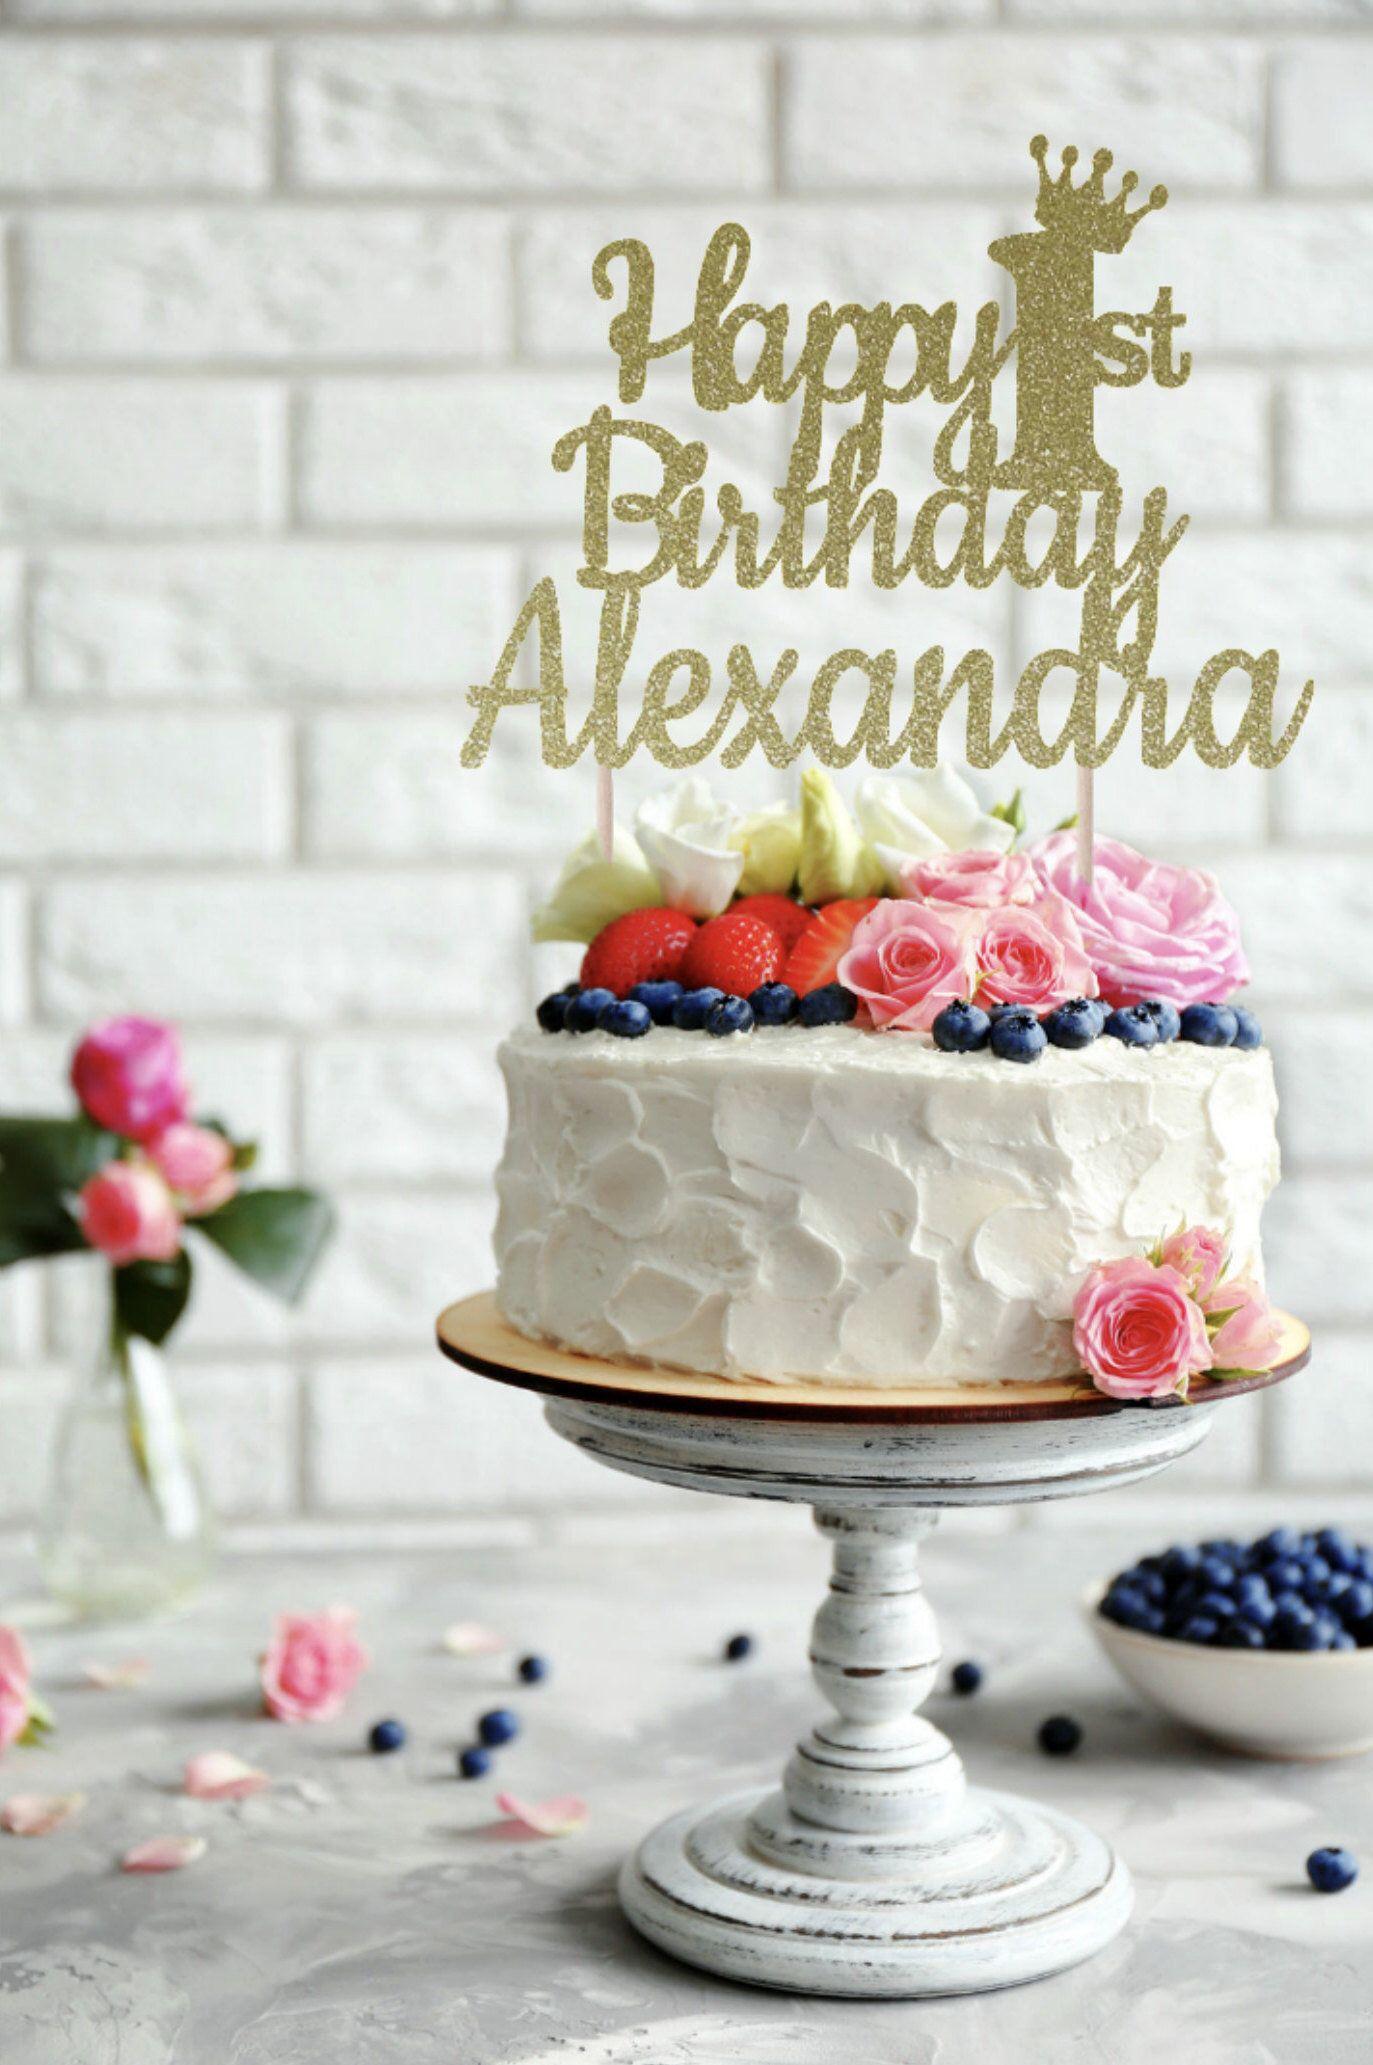 Any name any age happy birthday cake topper birthday cake topper